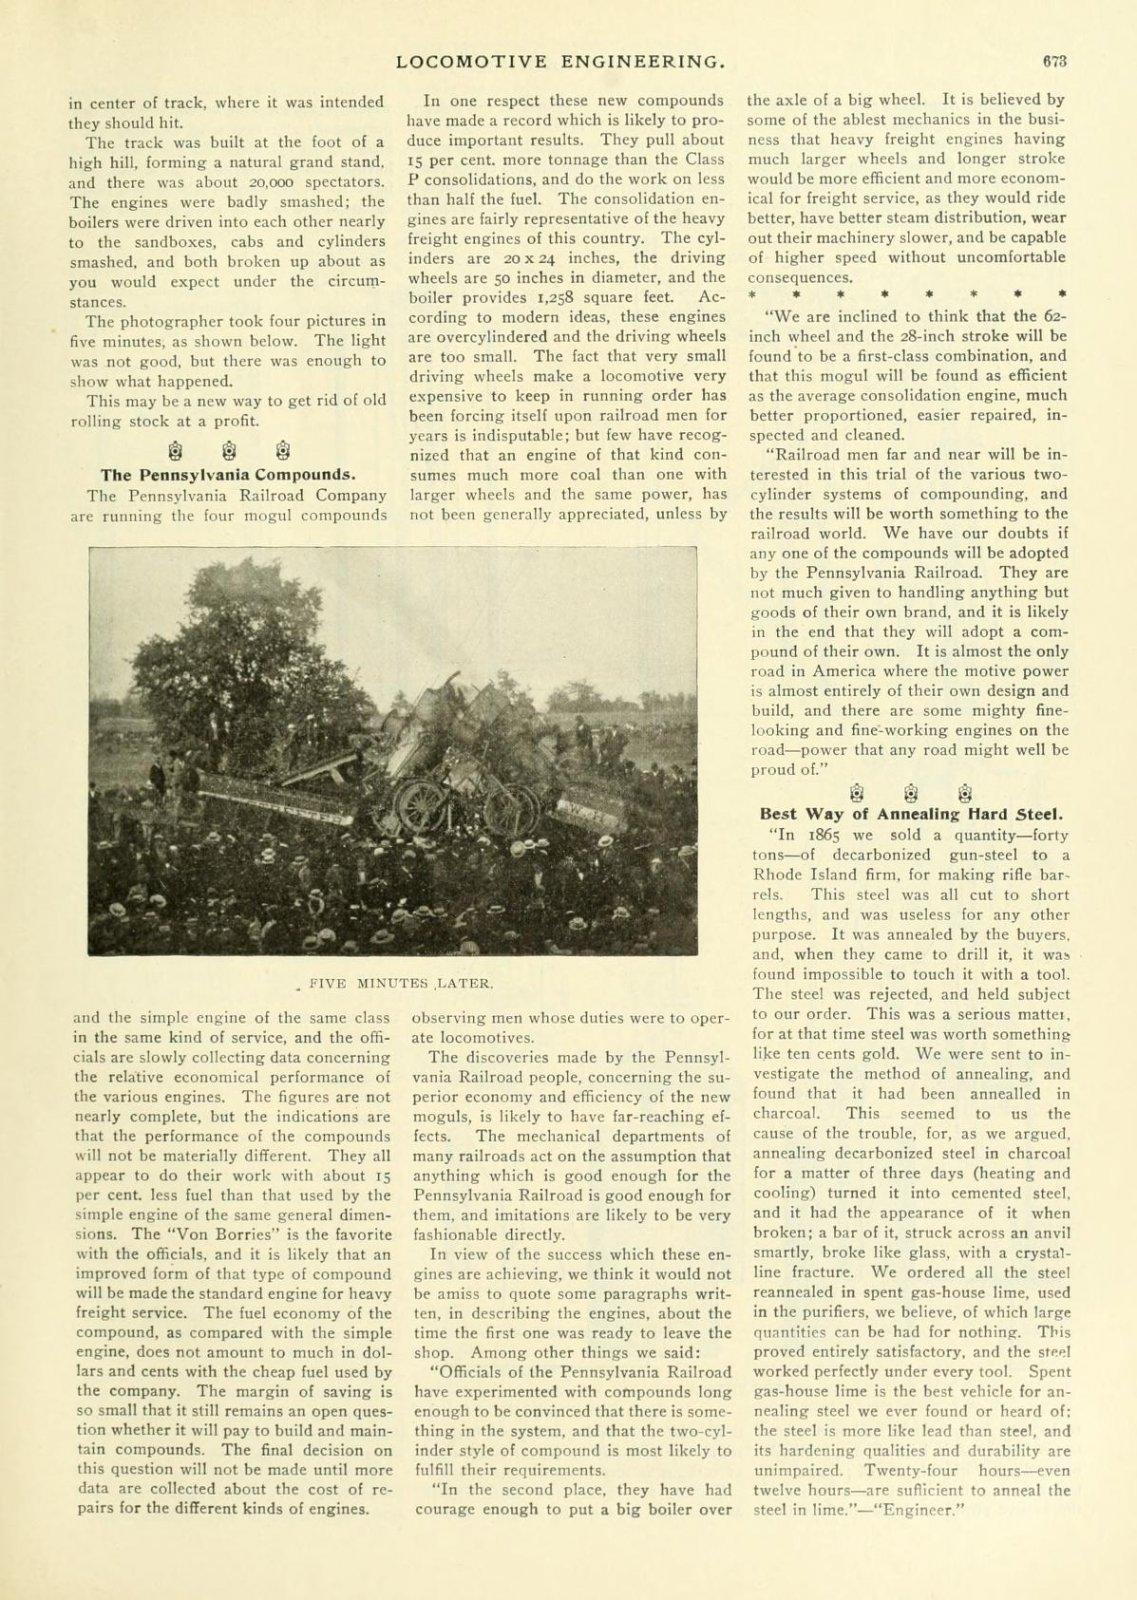 locomotiveengine 1892 collision  2.jpg